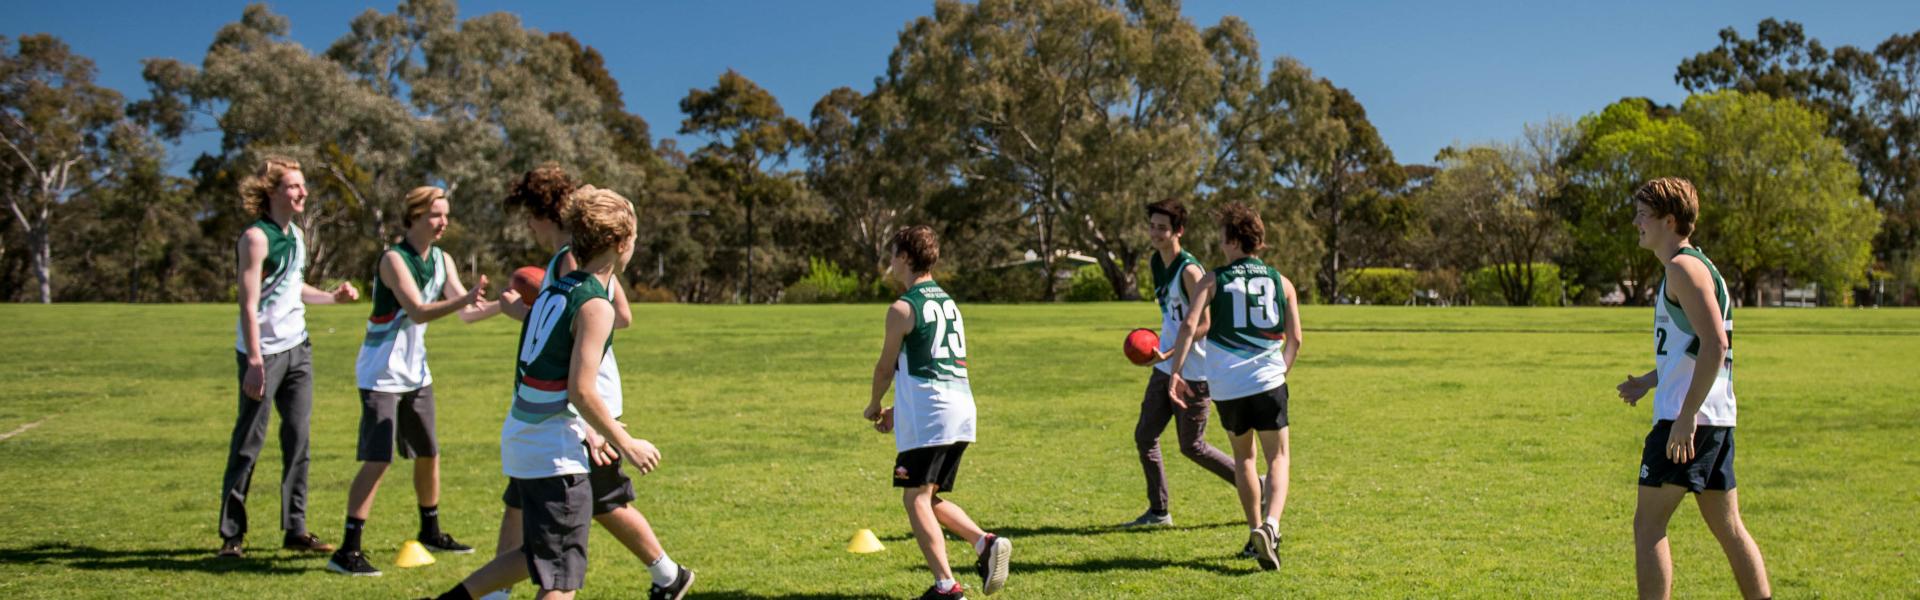 Blackwood High School Public South Australia Australia Students Playing Sports